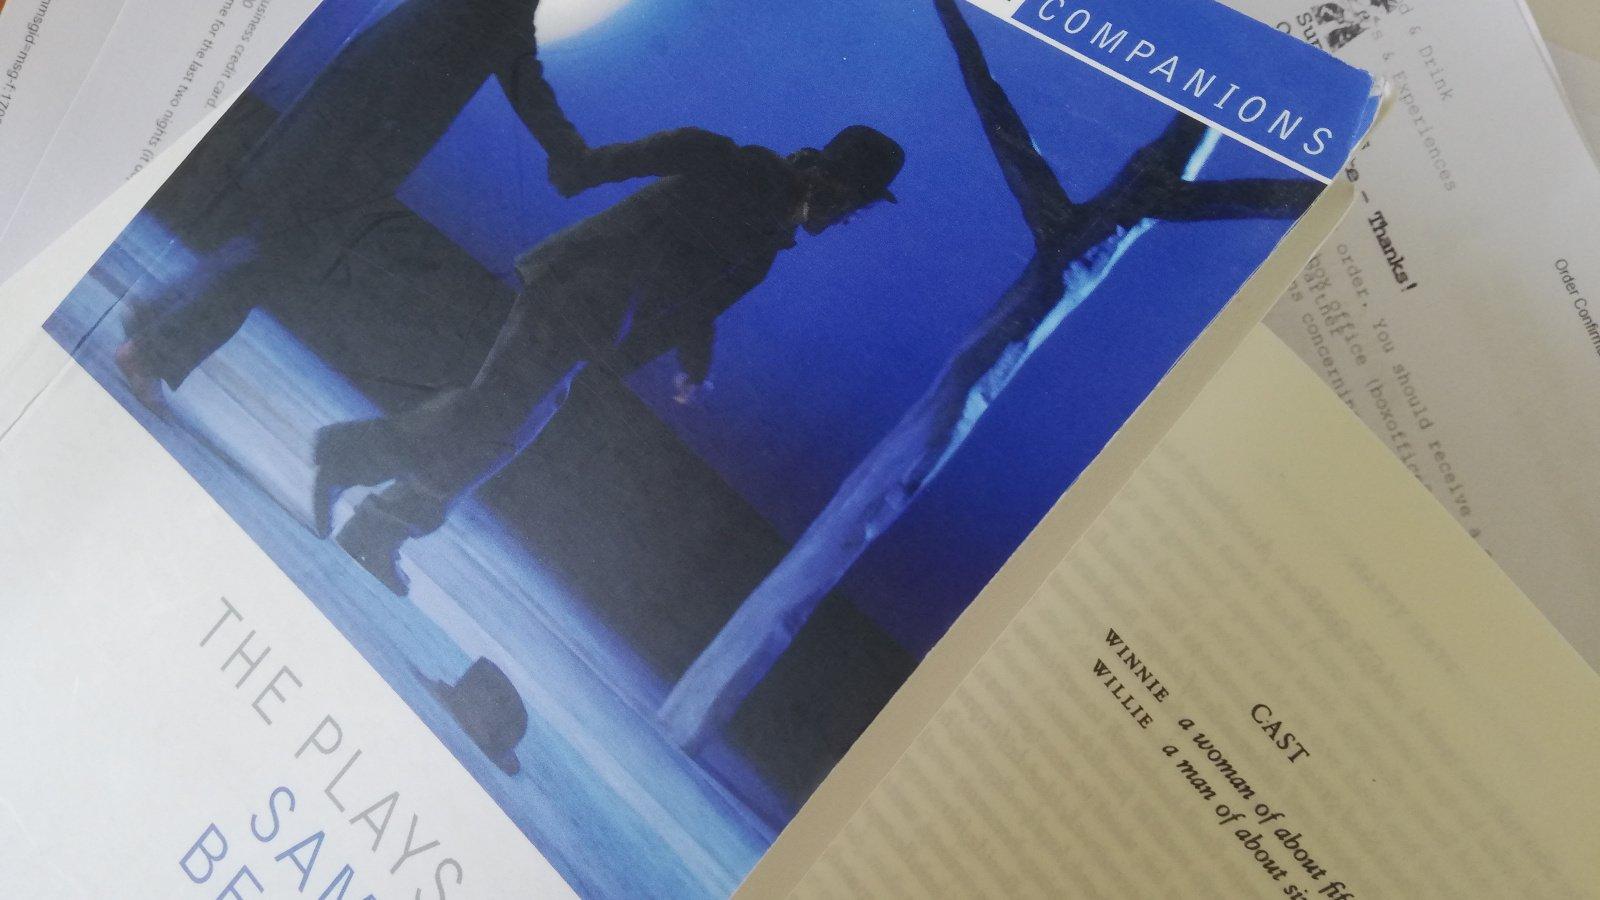 laethanta sona - 03 past - italishmagazine